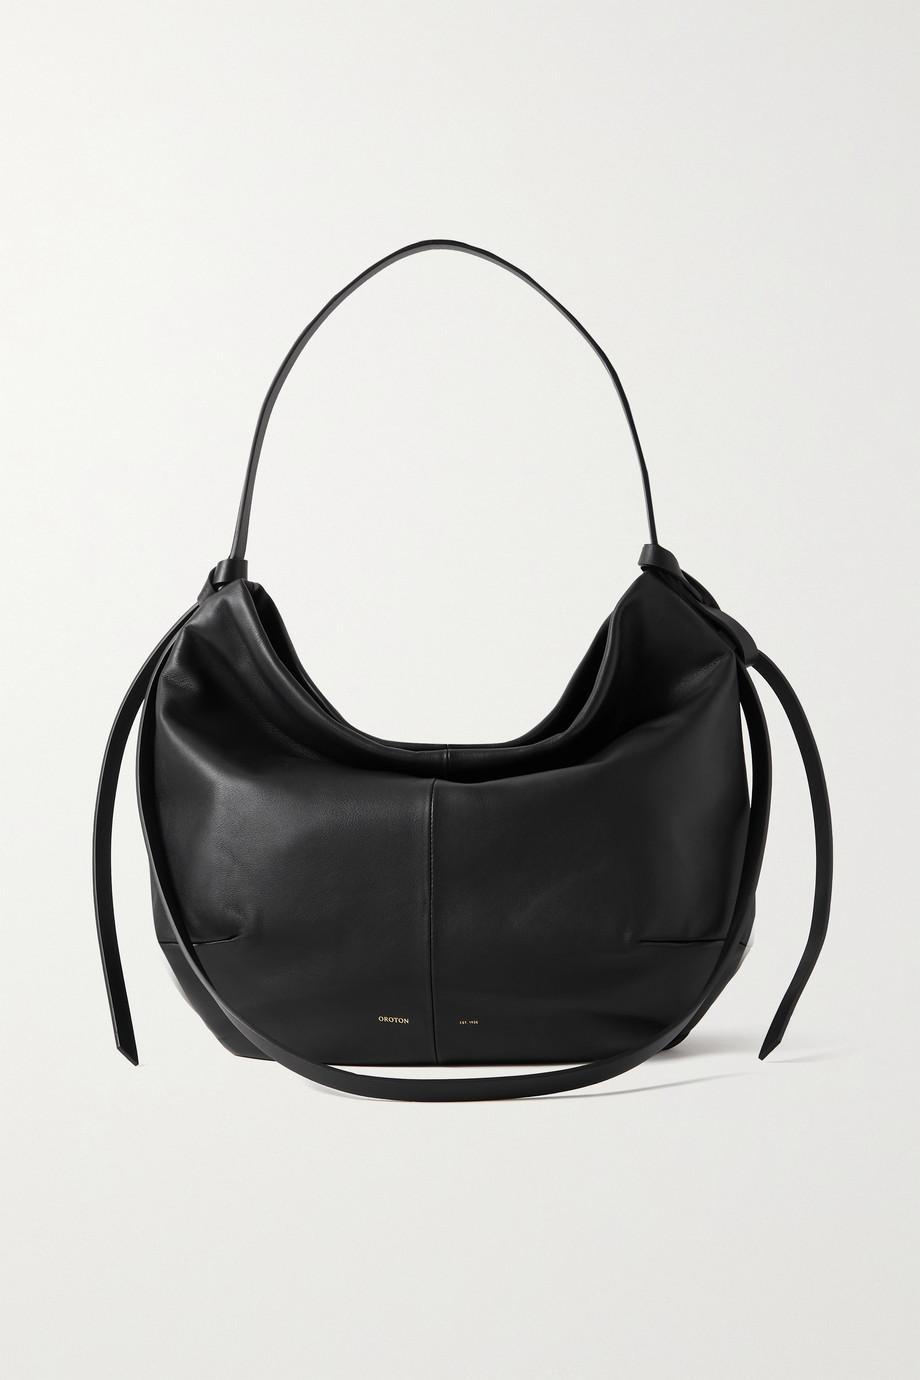 Oroton Brodie leather shoulder bag